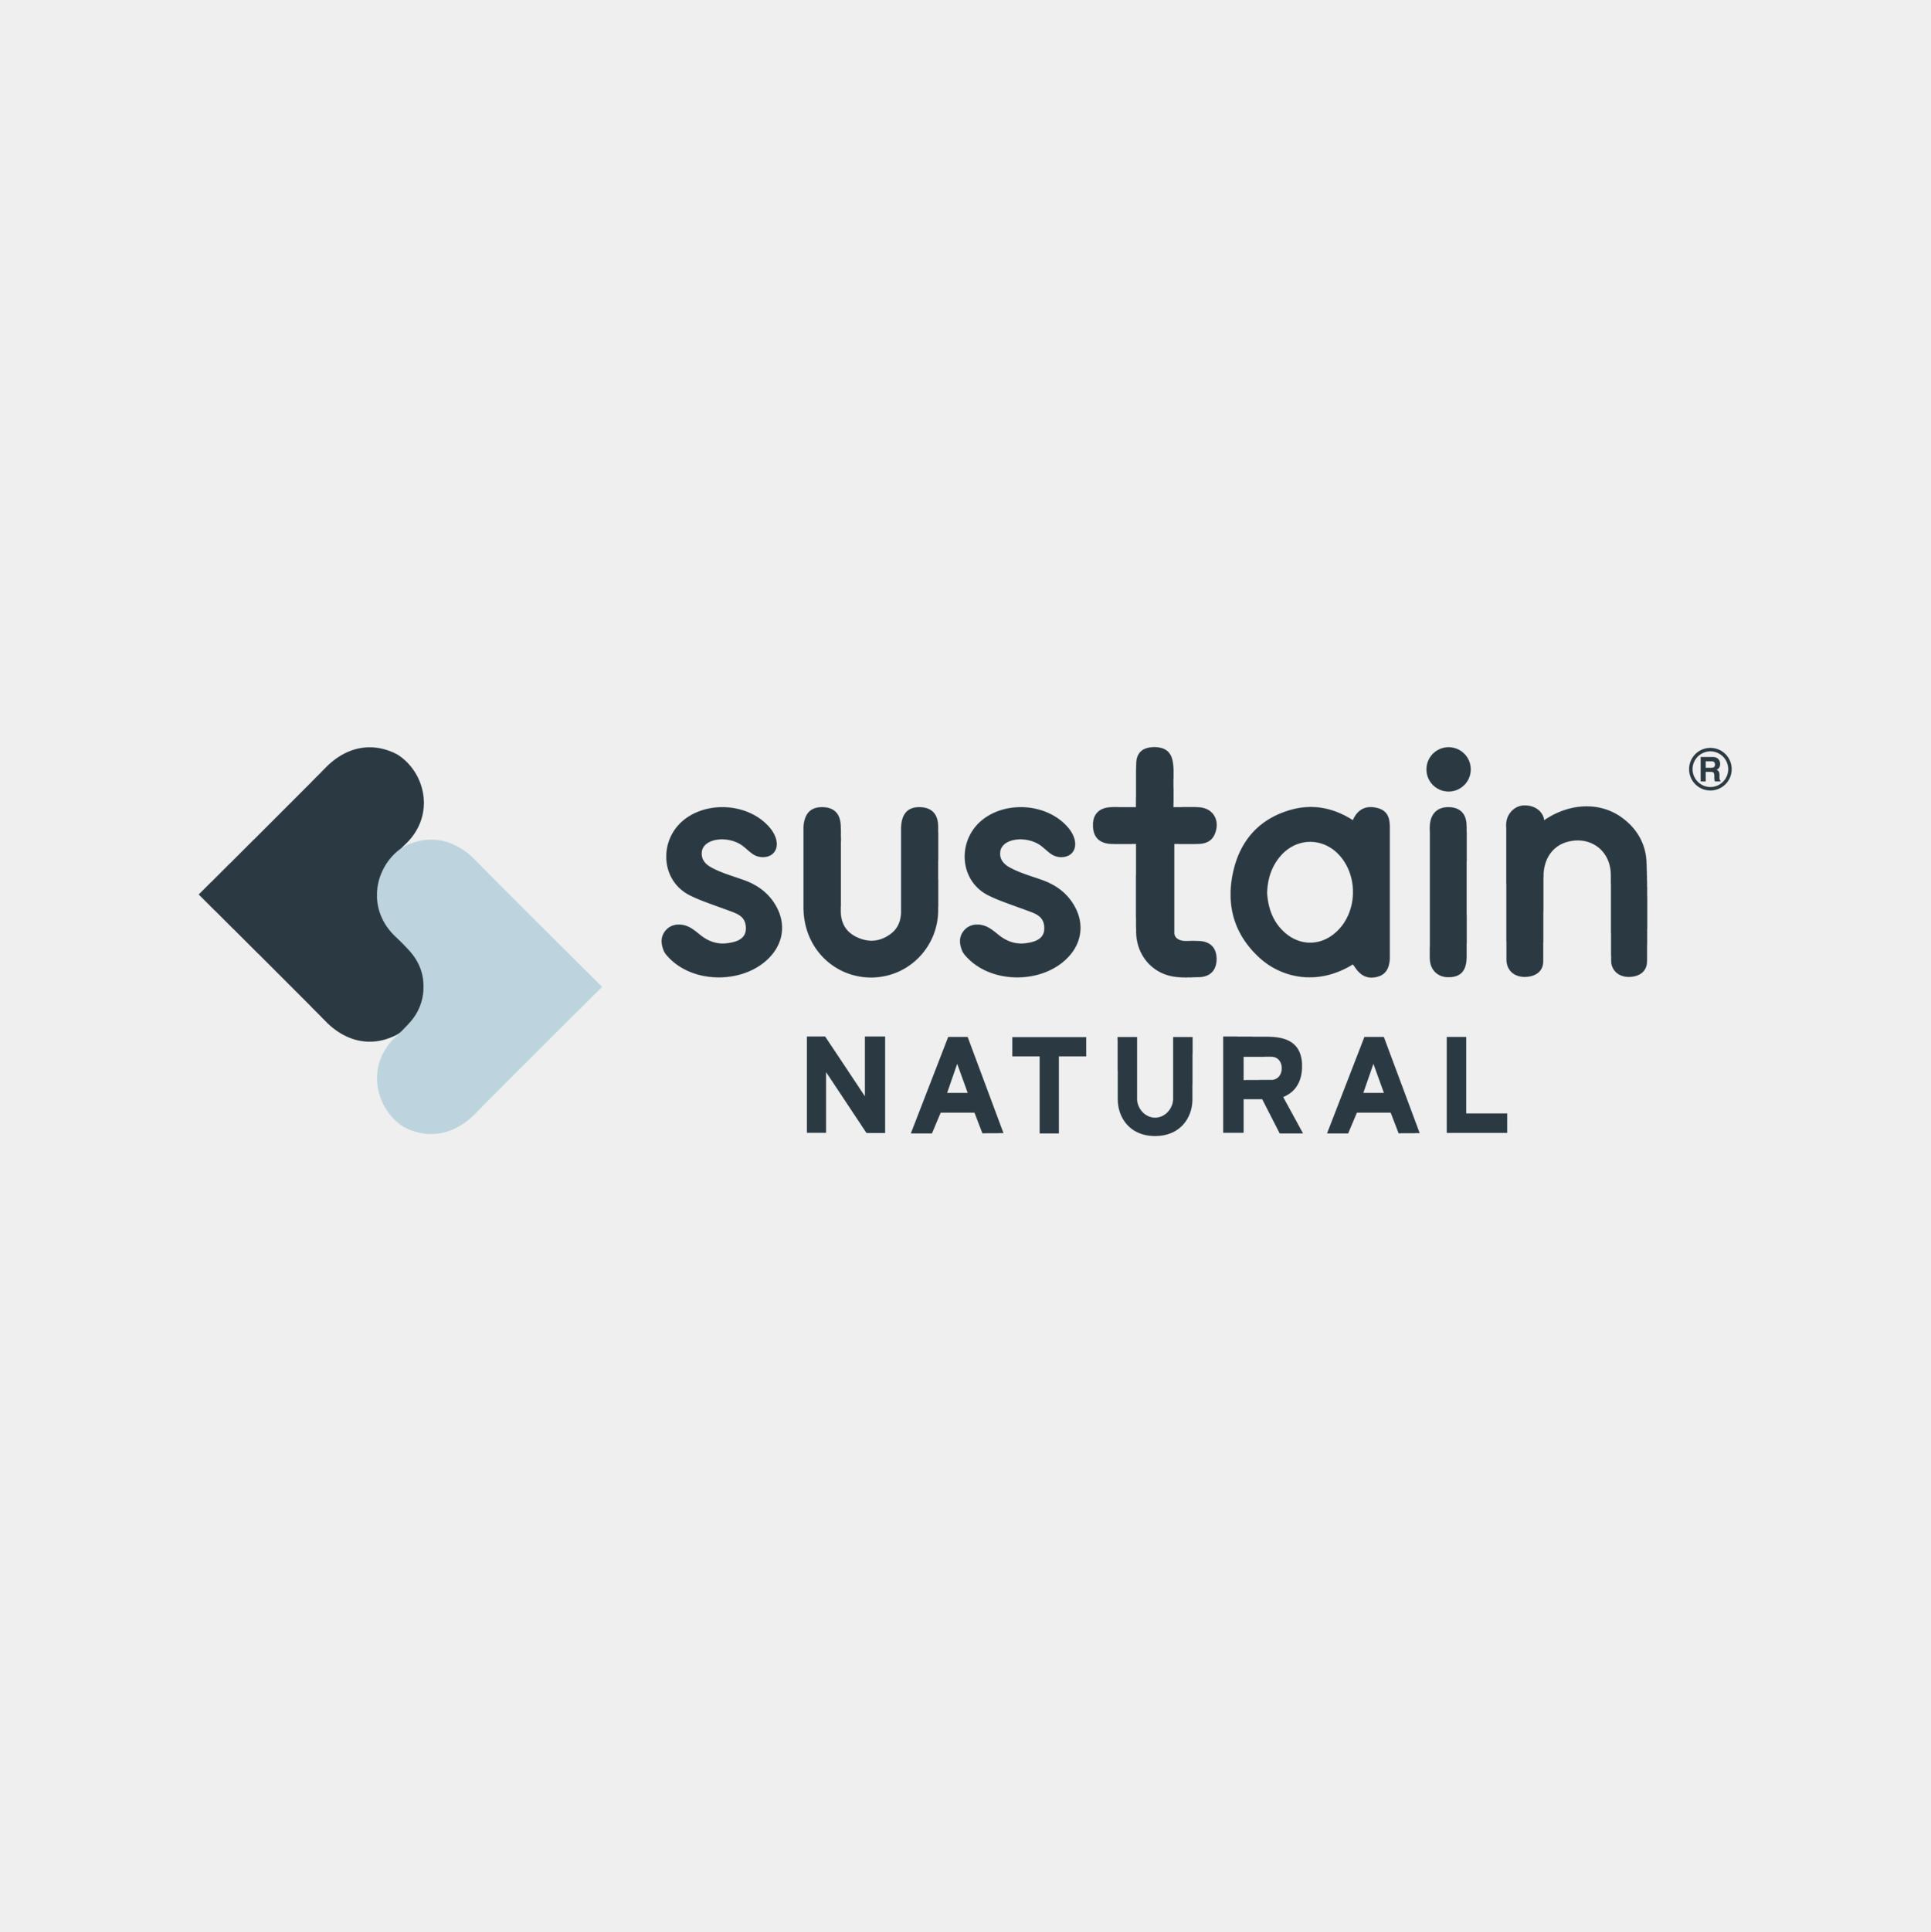 SustainNatural.png